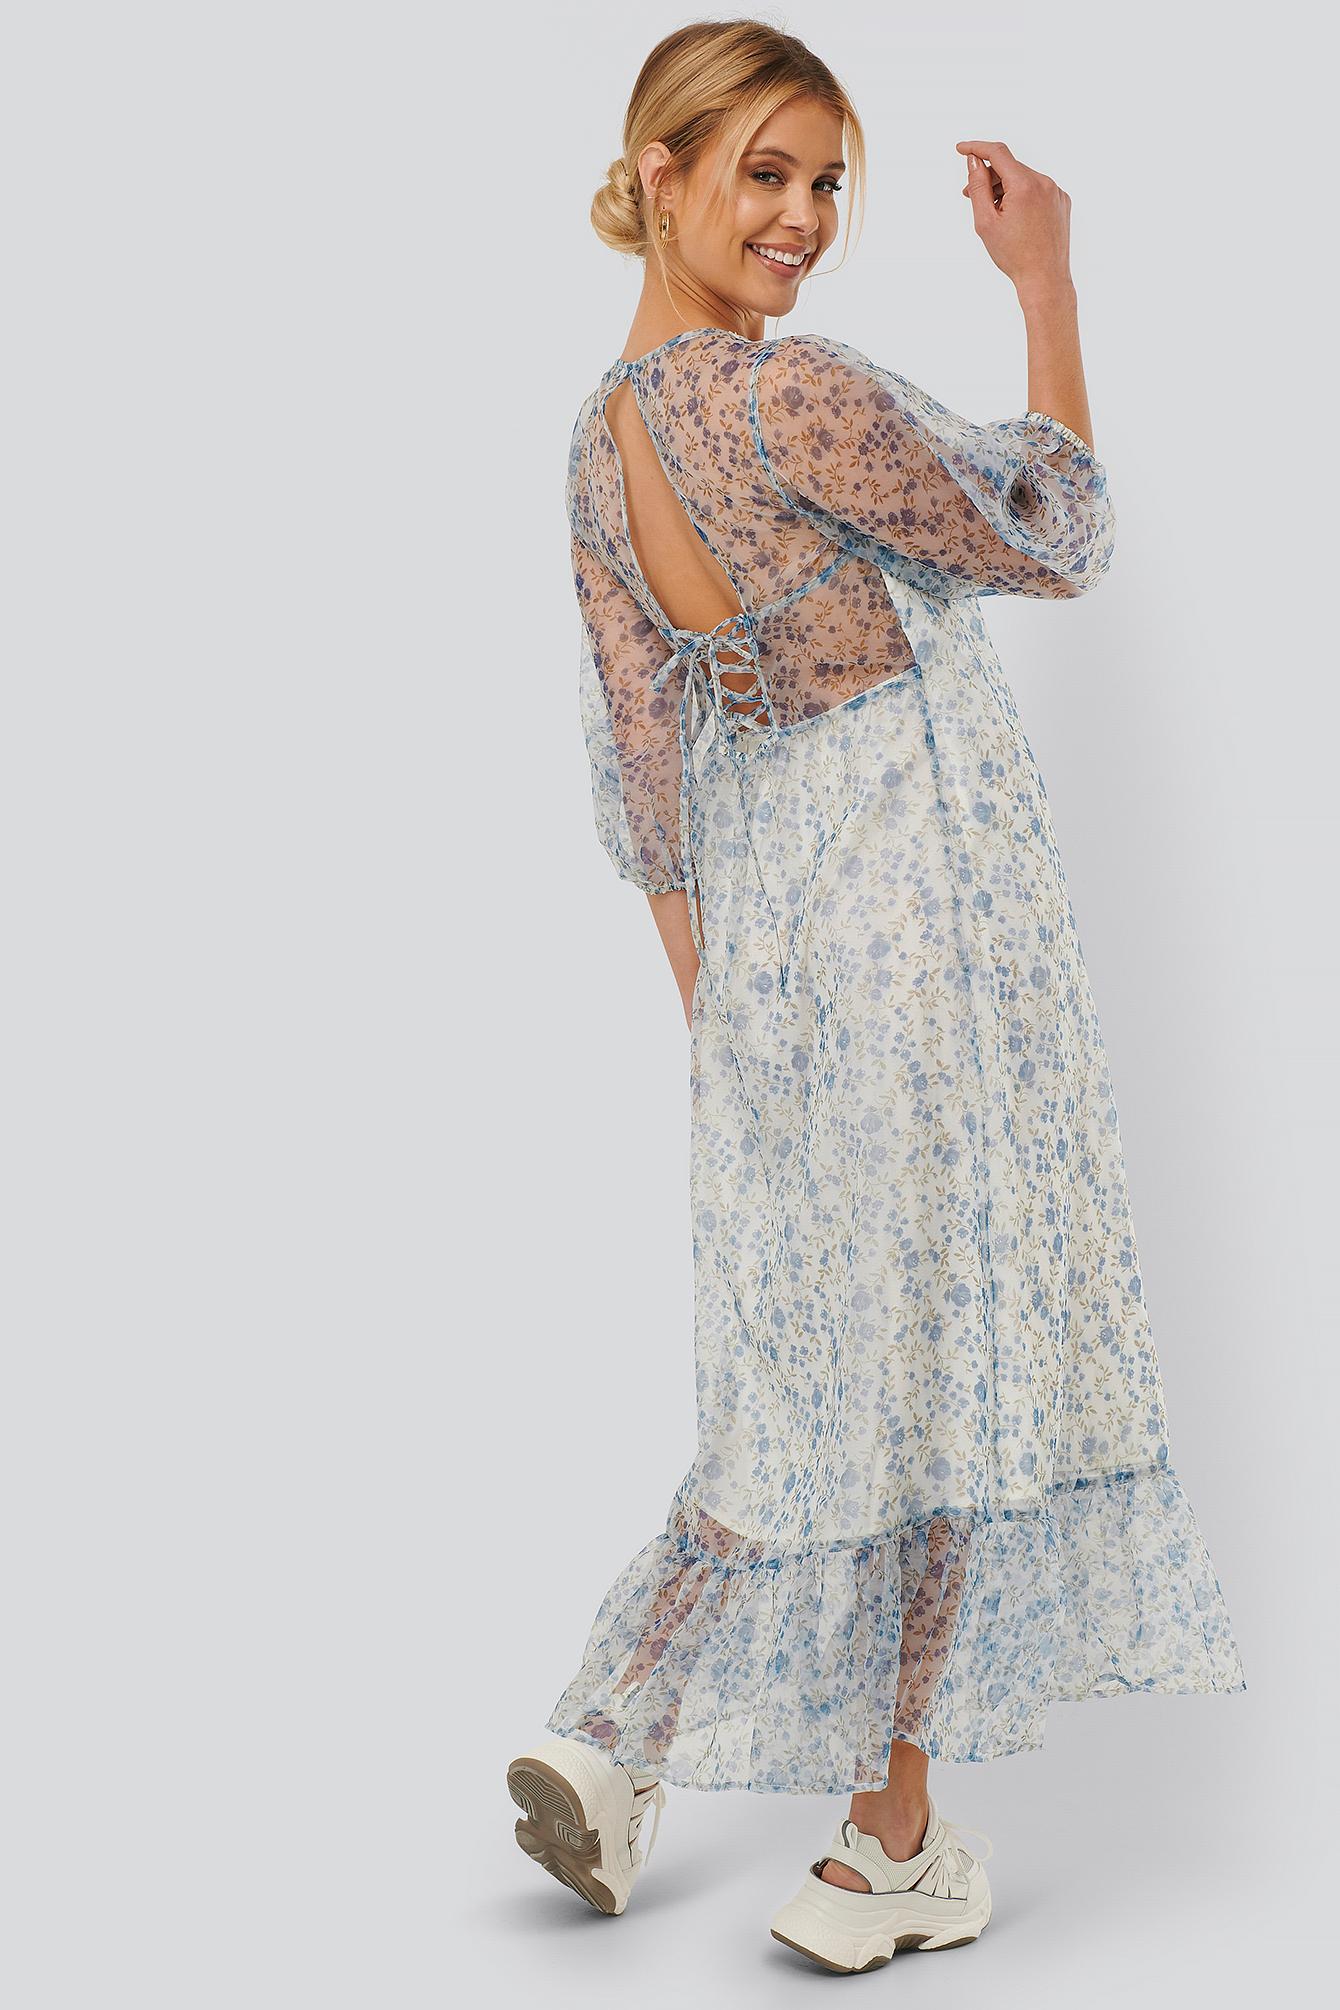 NA-KD Boho Flower Printed Organza Open Back Dress - Blue